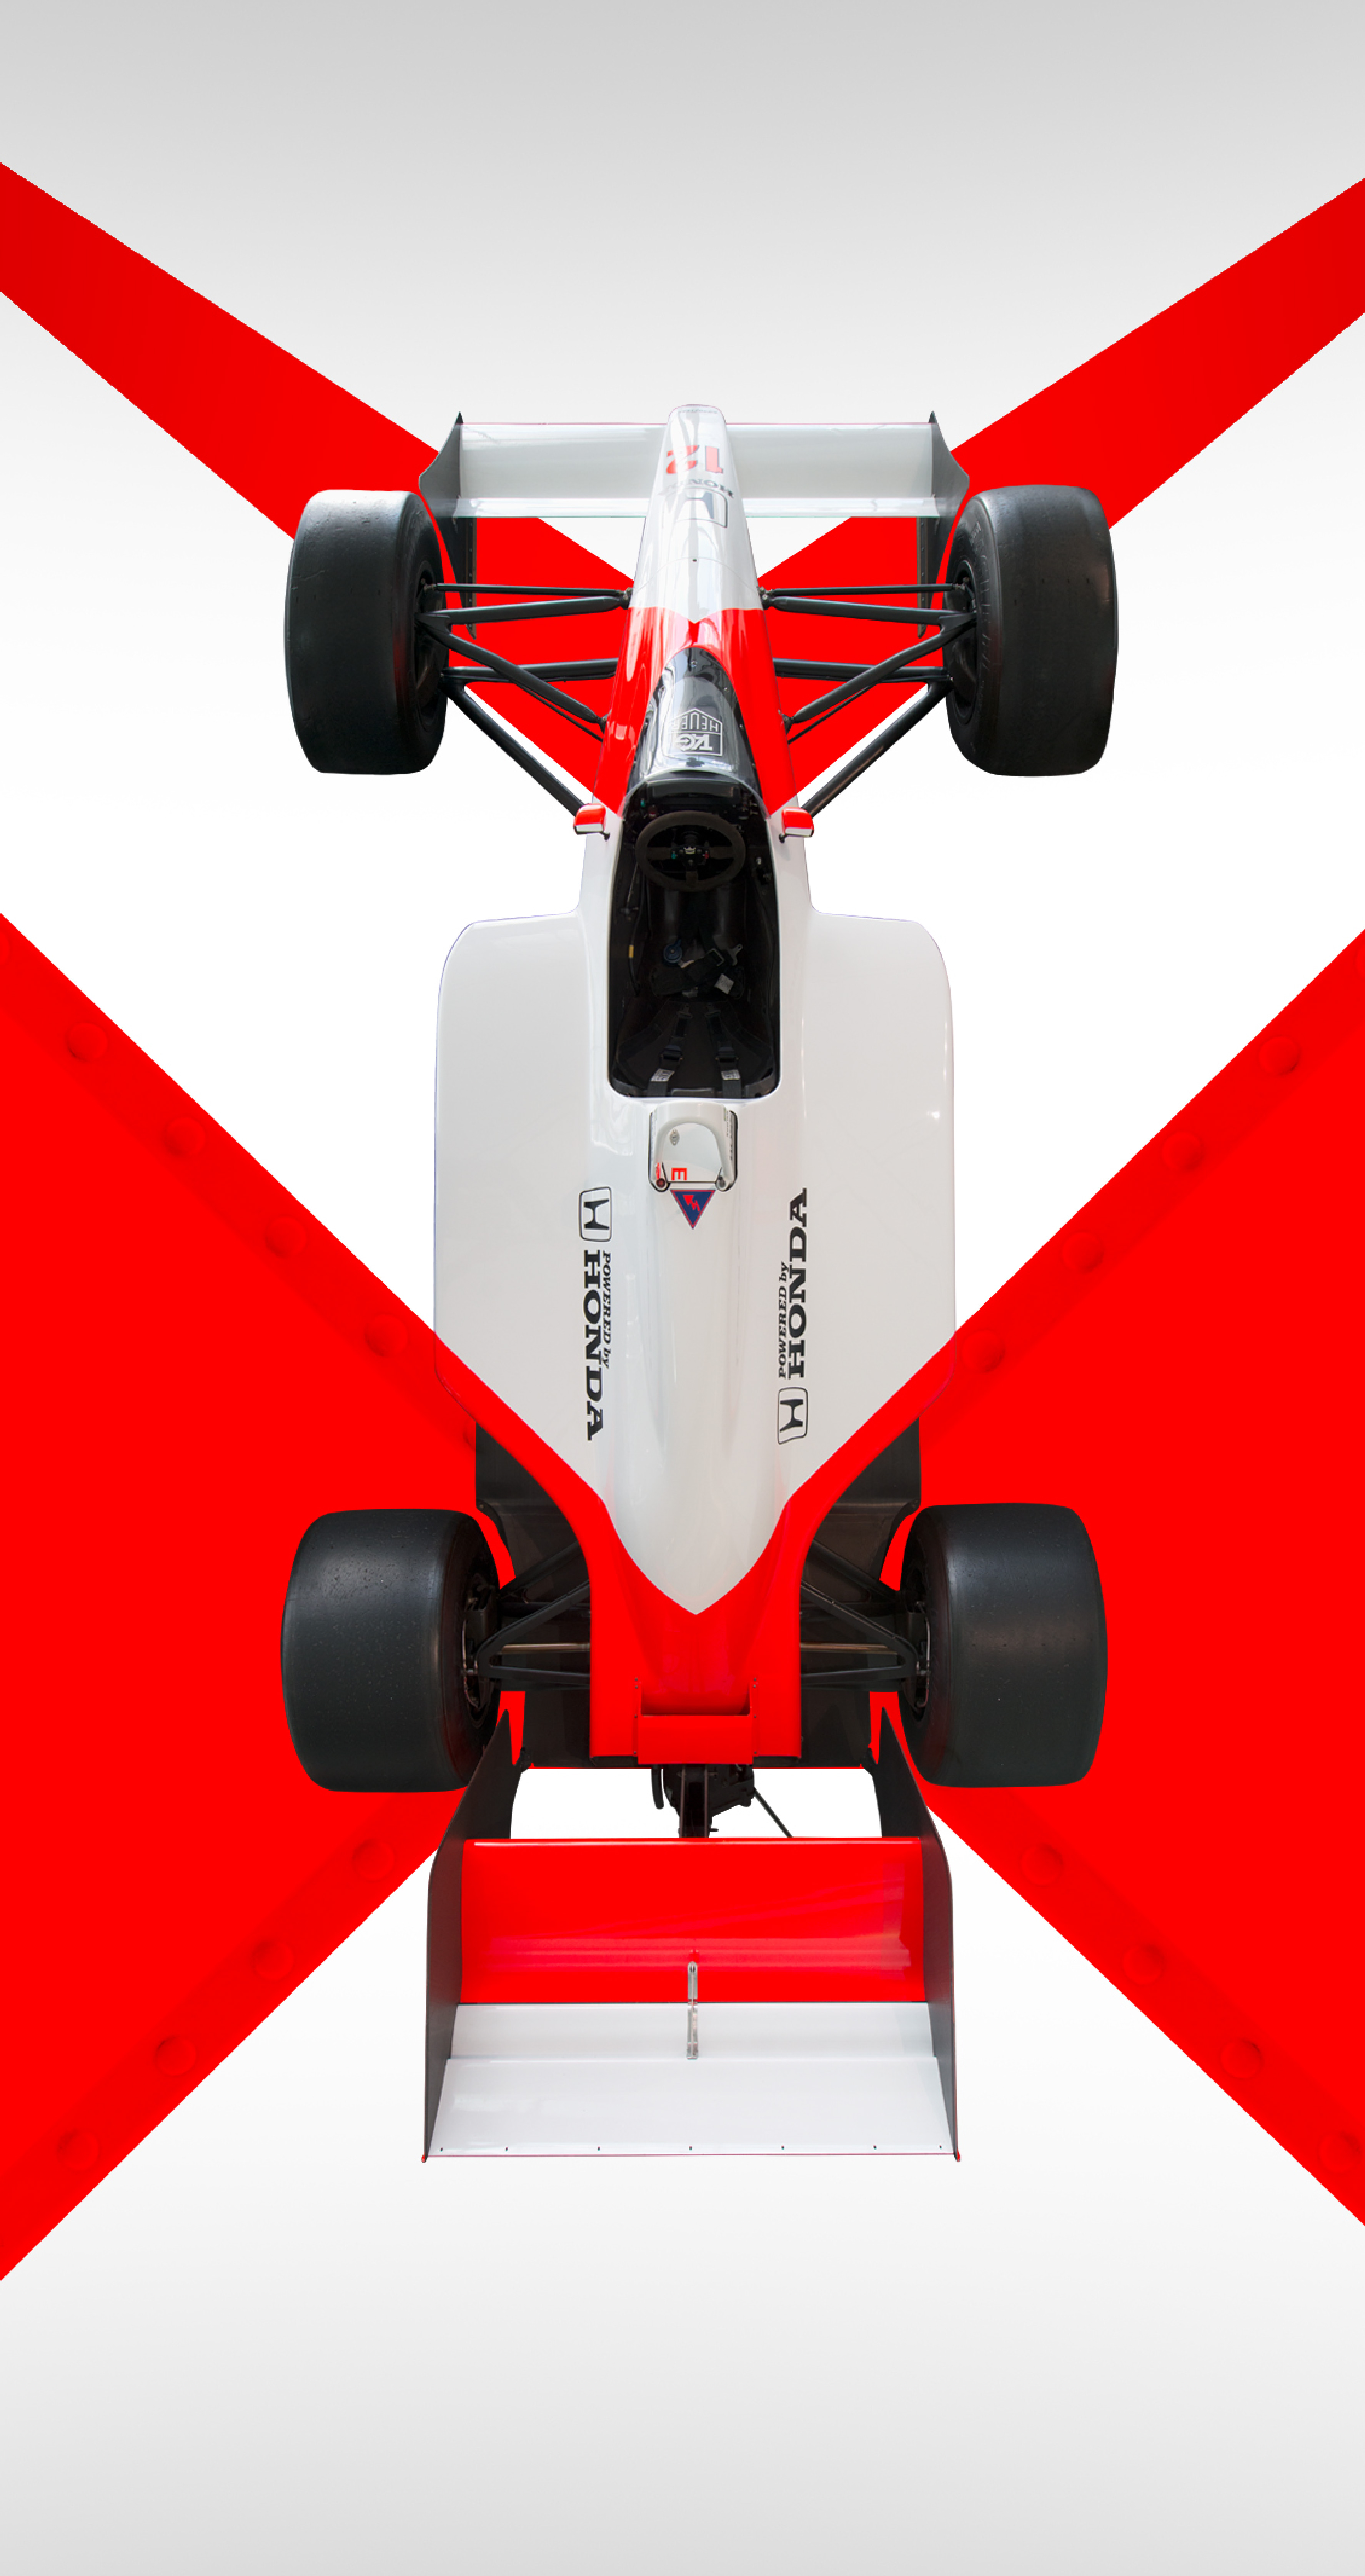 Mclaren Formula 1 Wallpaper 3550x6700   Mclaren Mp4 4 Wallpaper 3550x6700